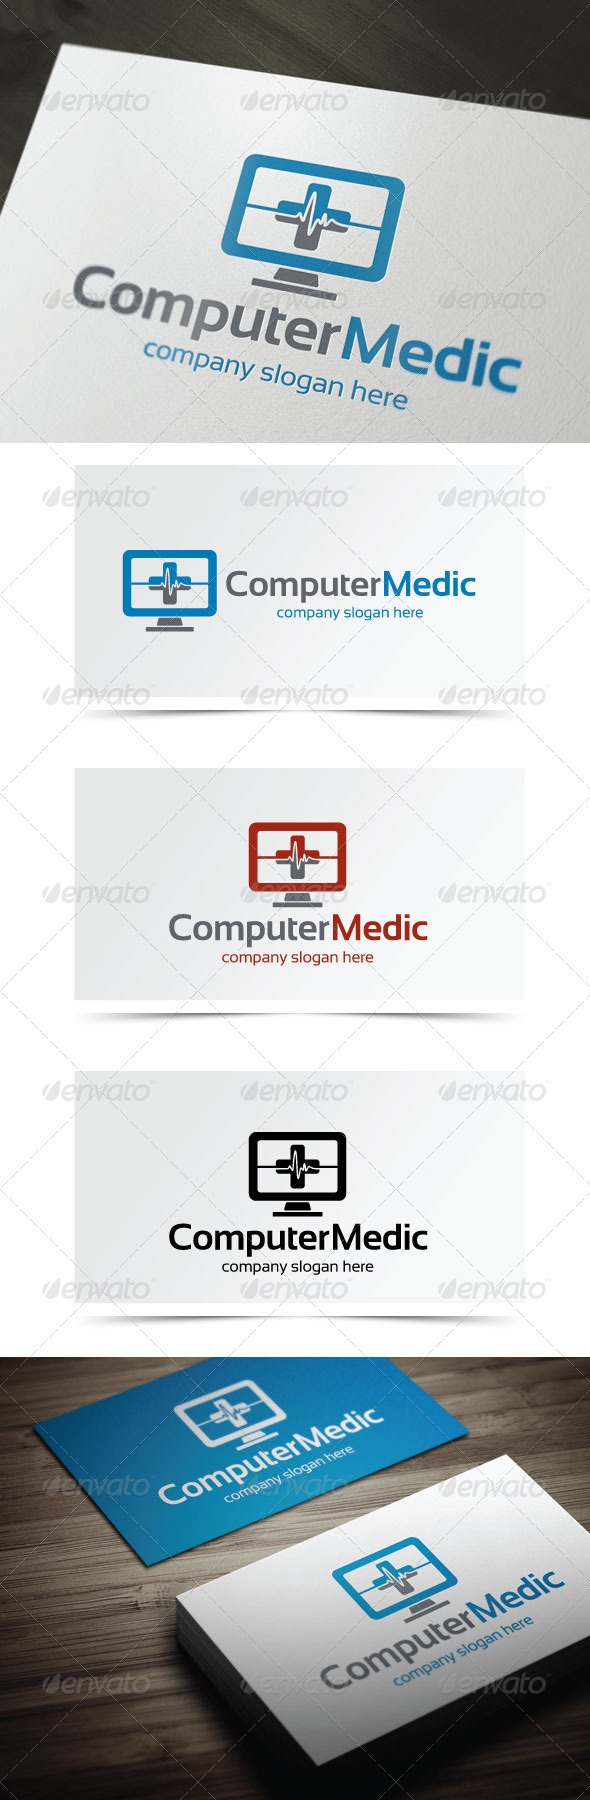 GraphicRiver Computer Medic 5483610